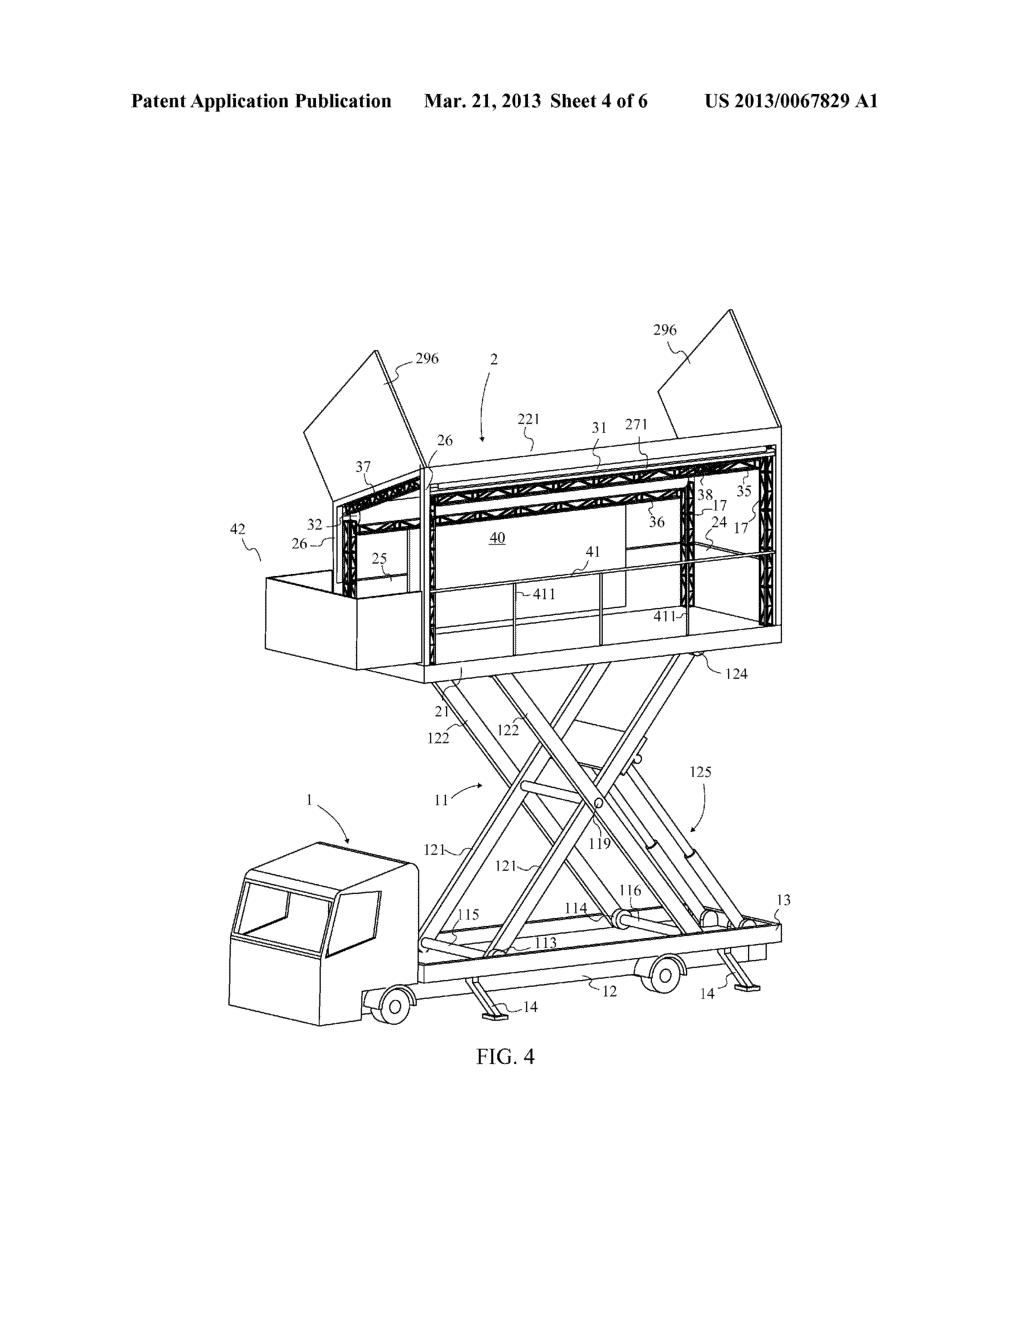 Hydraulic Lift Schematic